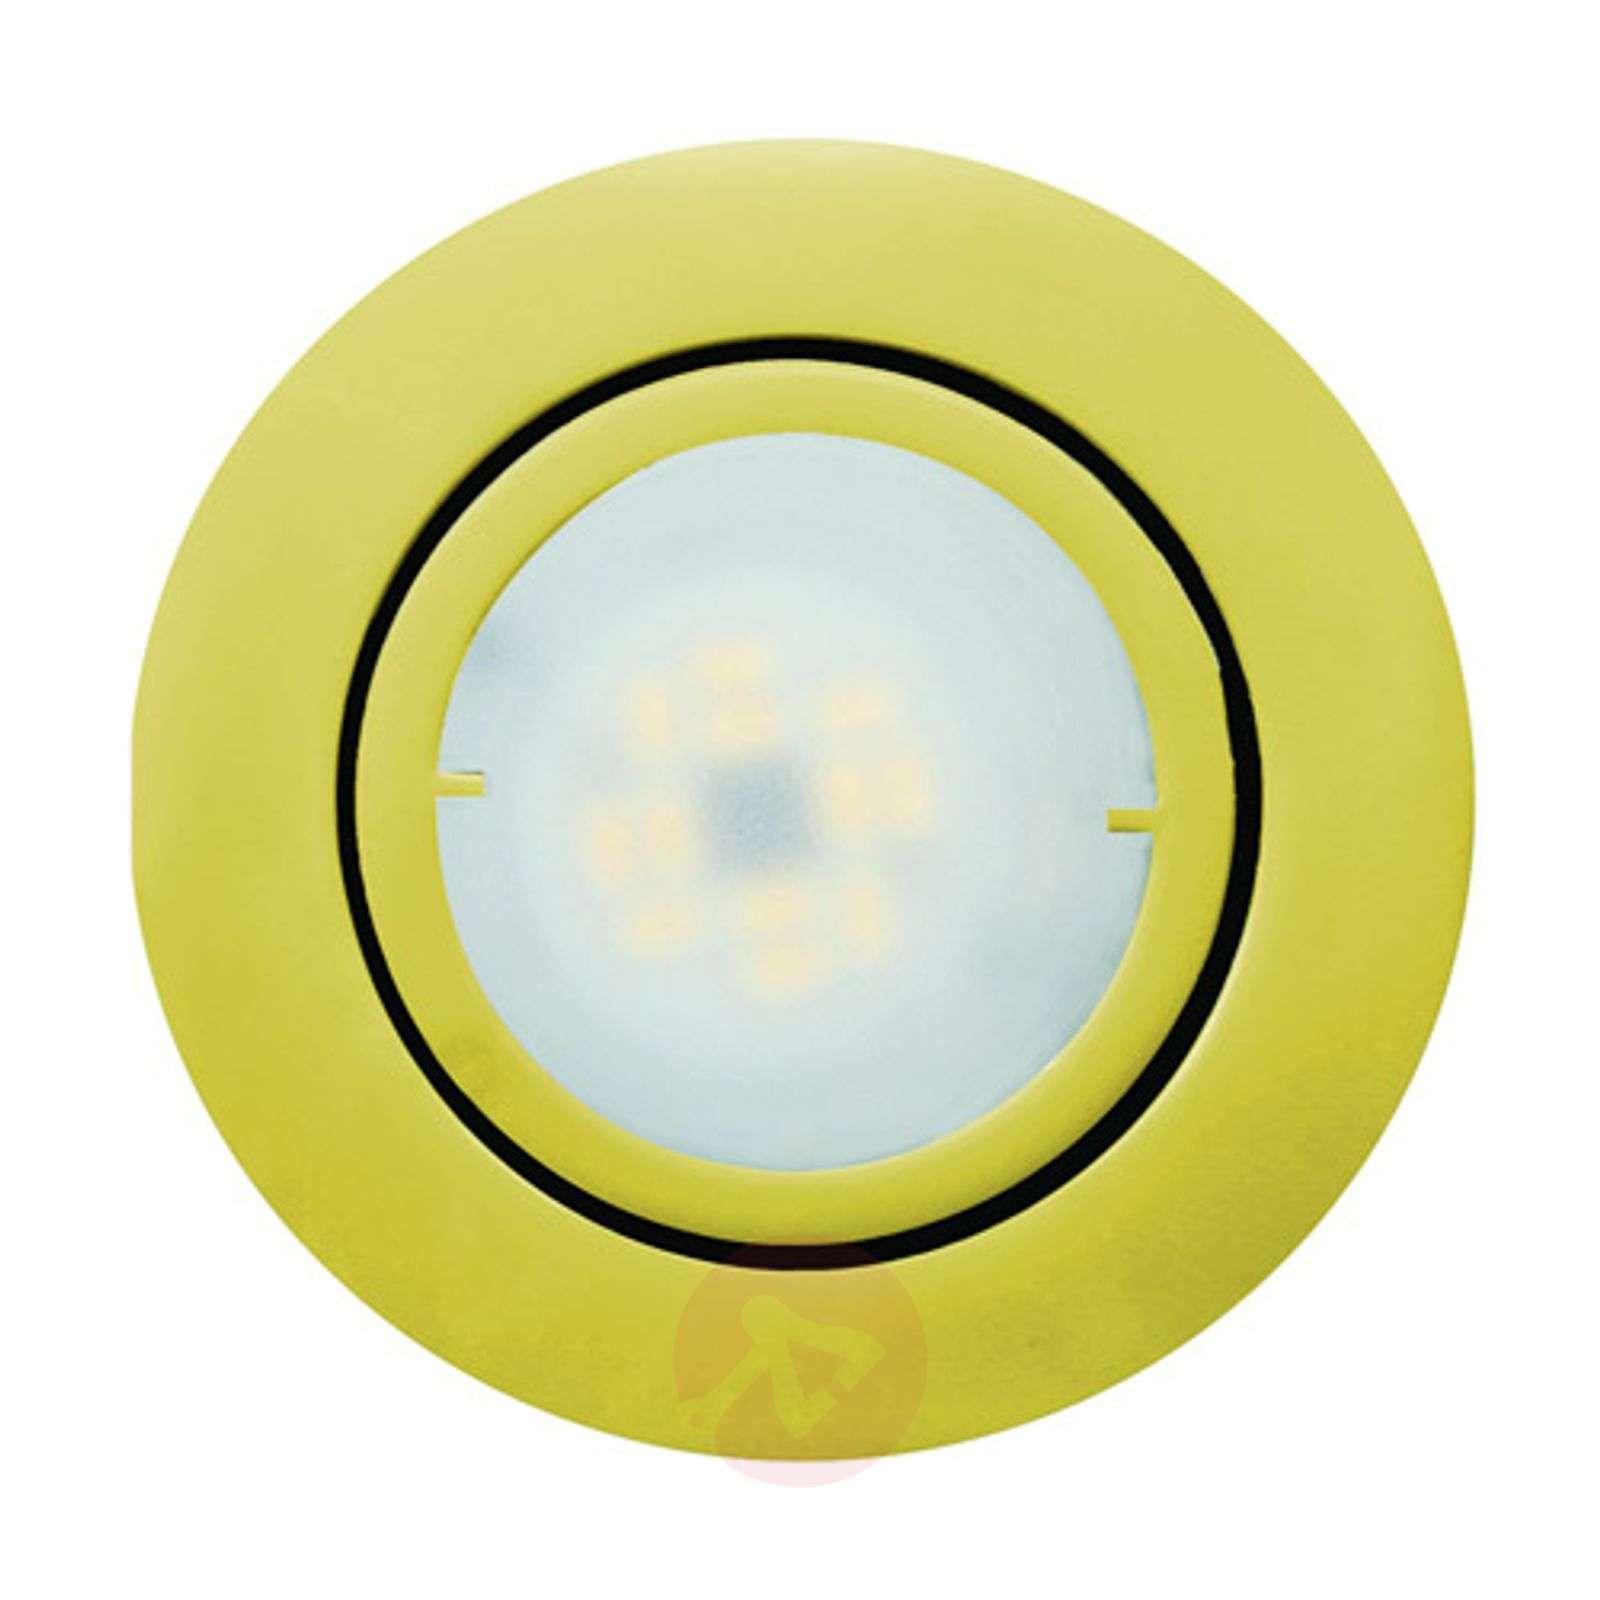 Golden LED recessed light Joanie, pivotable_1524113_1